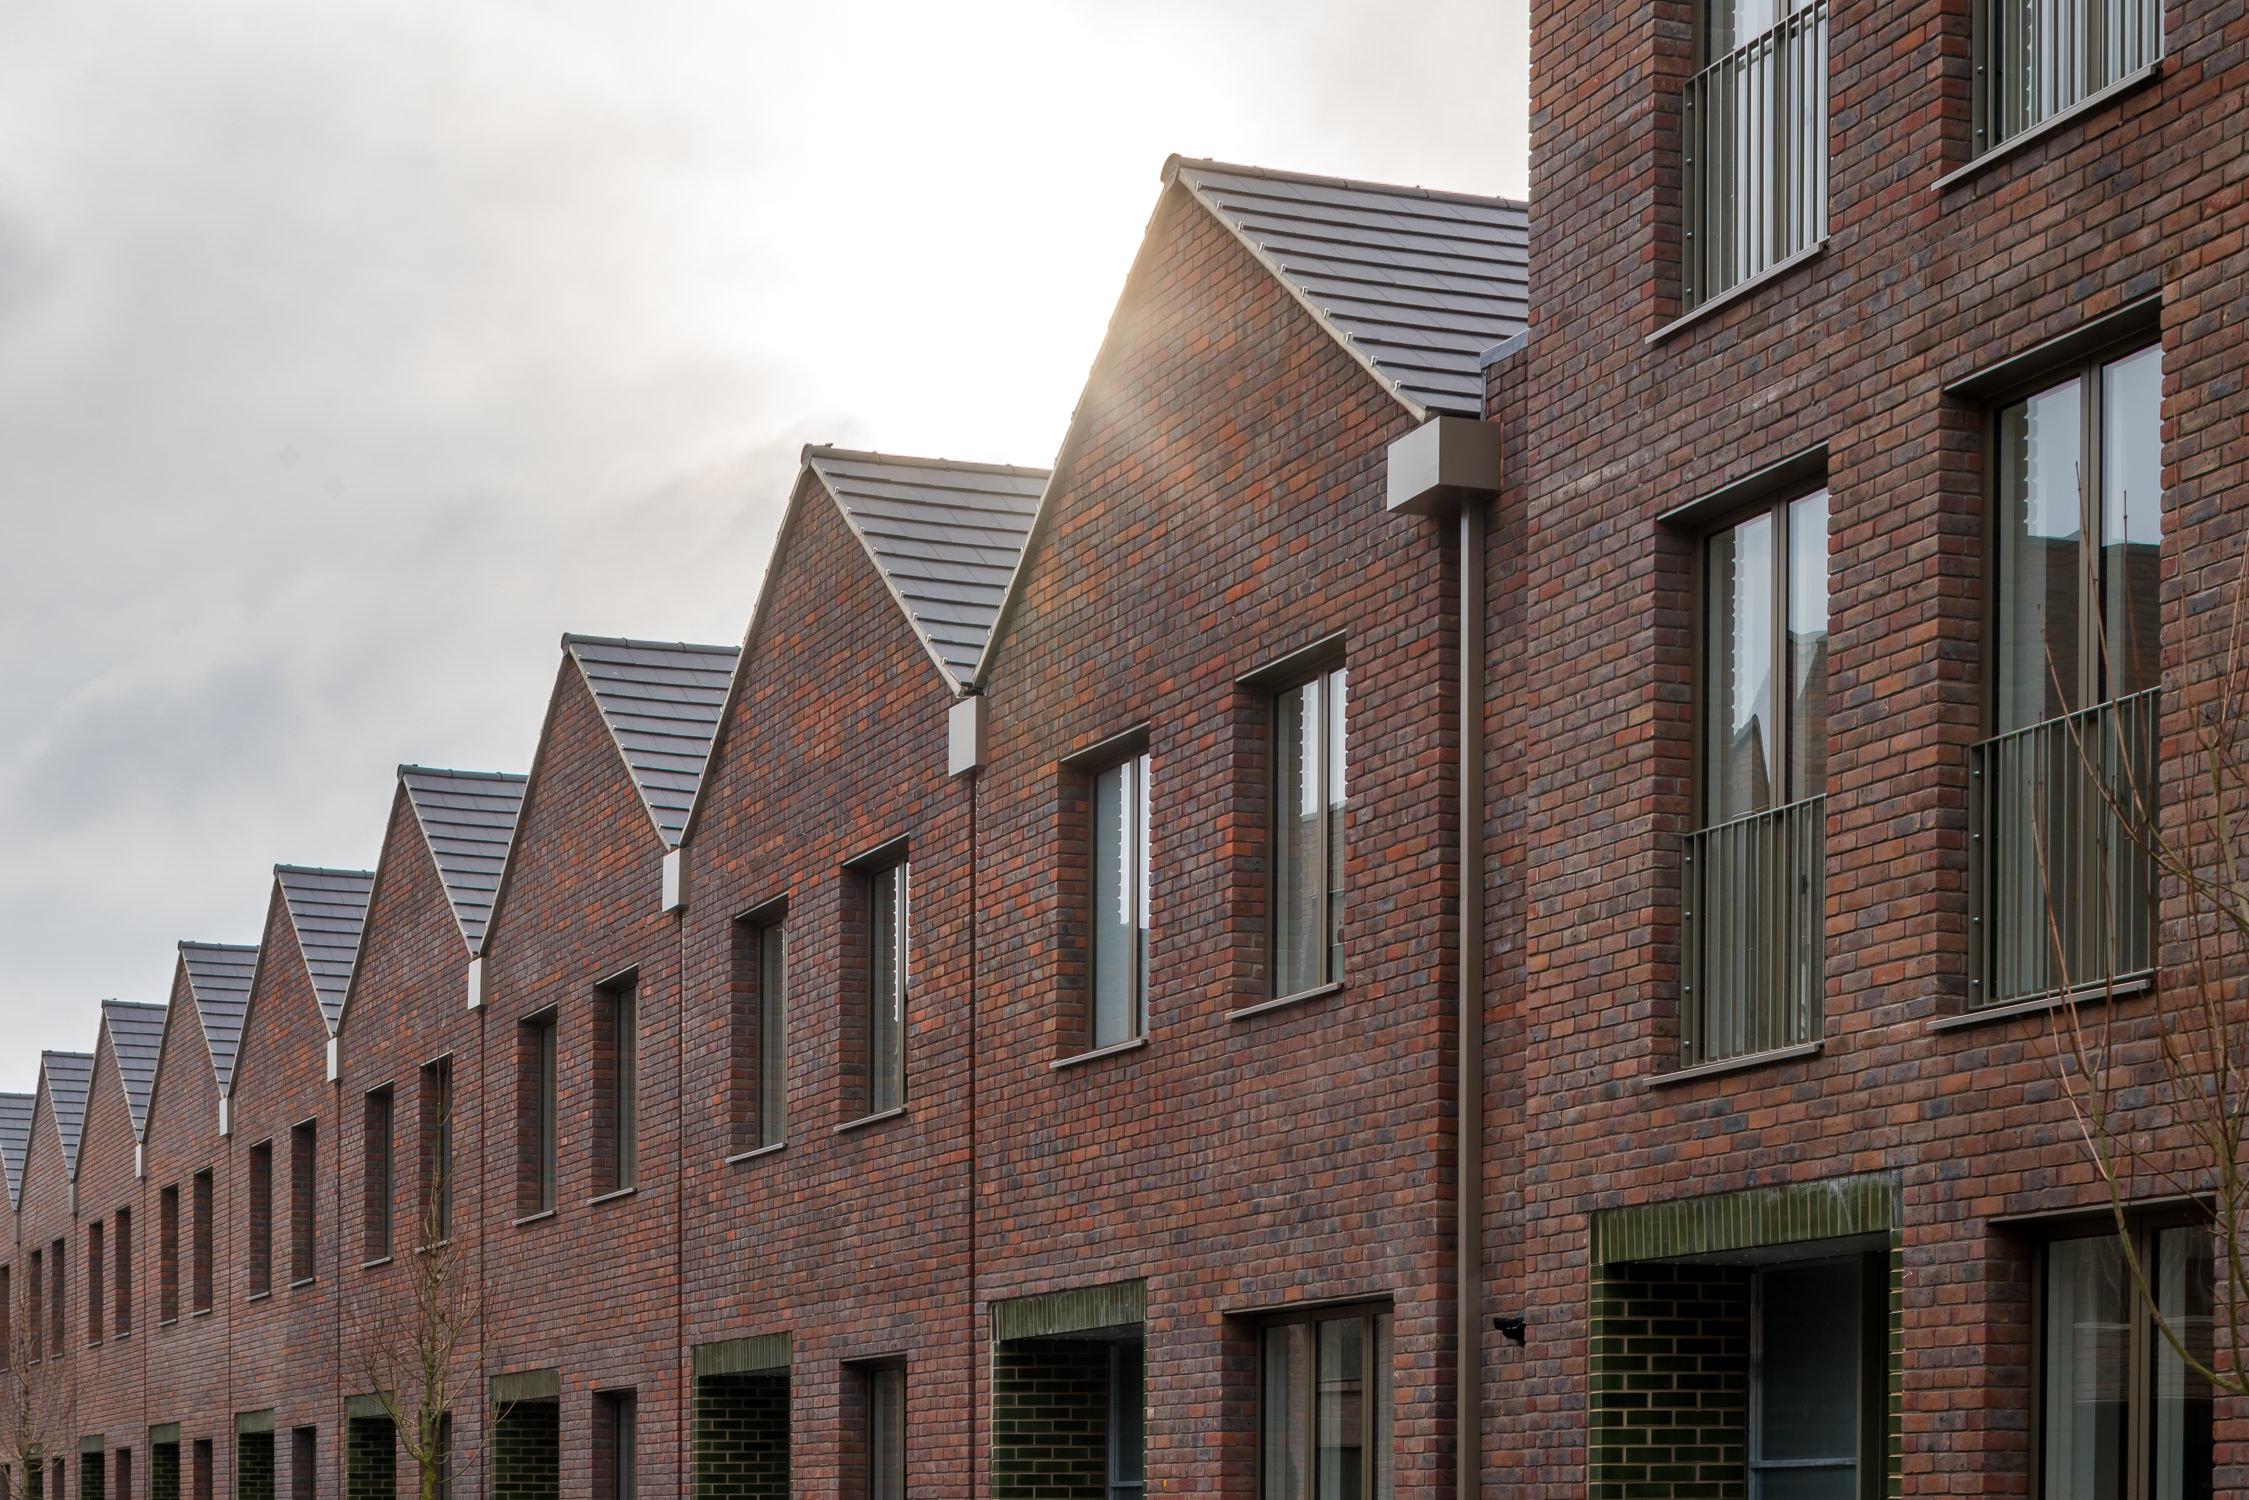 mark-hadden-architecture-photographer-architectuur-interieur-fotografie-london-amsterdam-Dujardin Mews-009.jpg